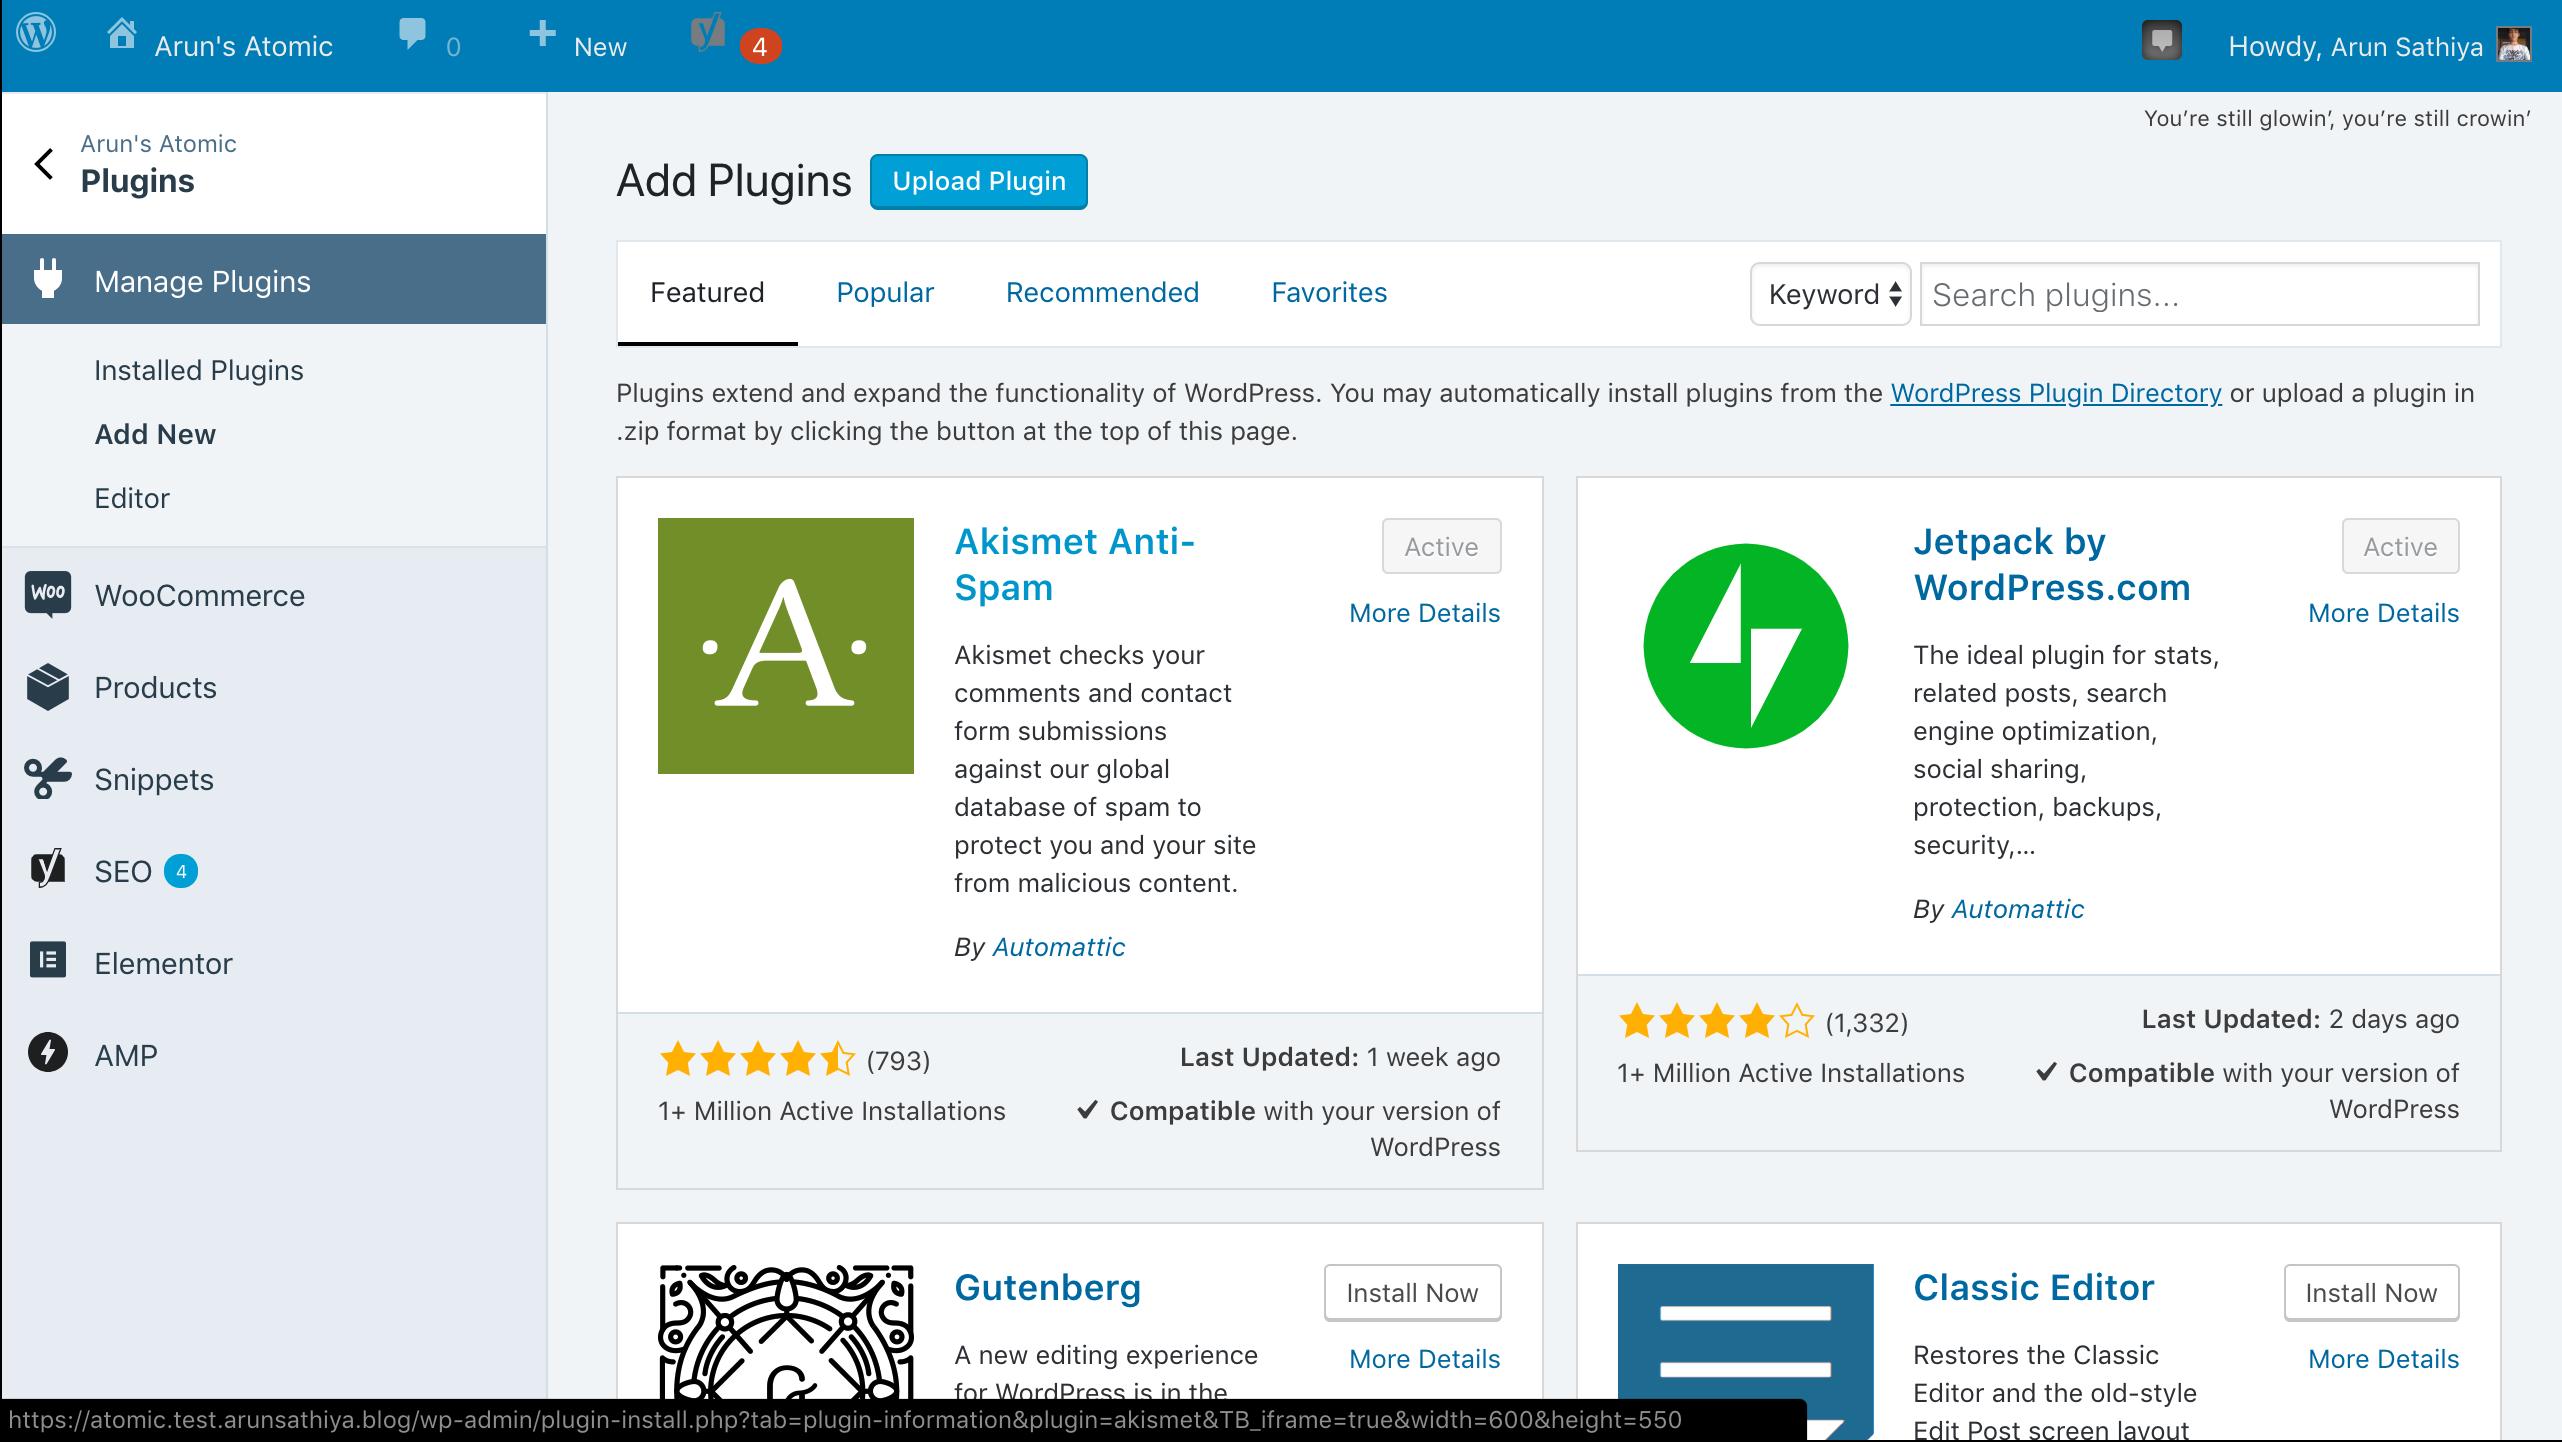 Calypsoify: Icon alignment issues with core WordPress admin